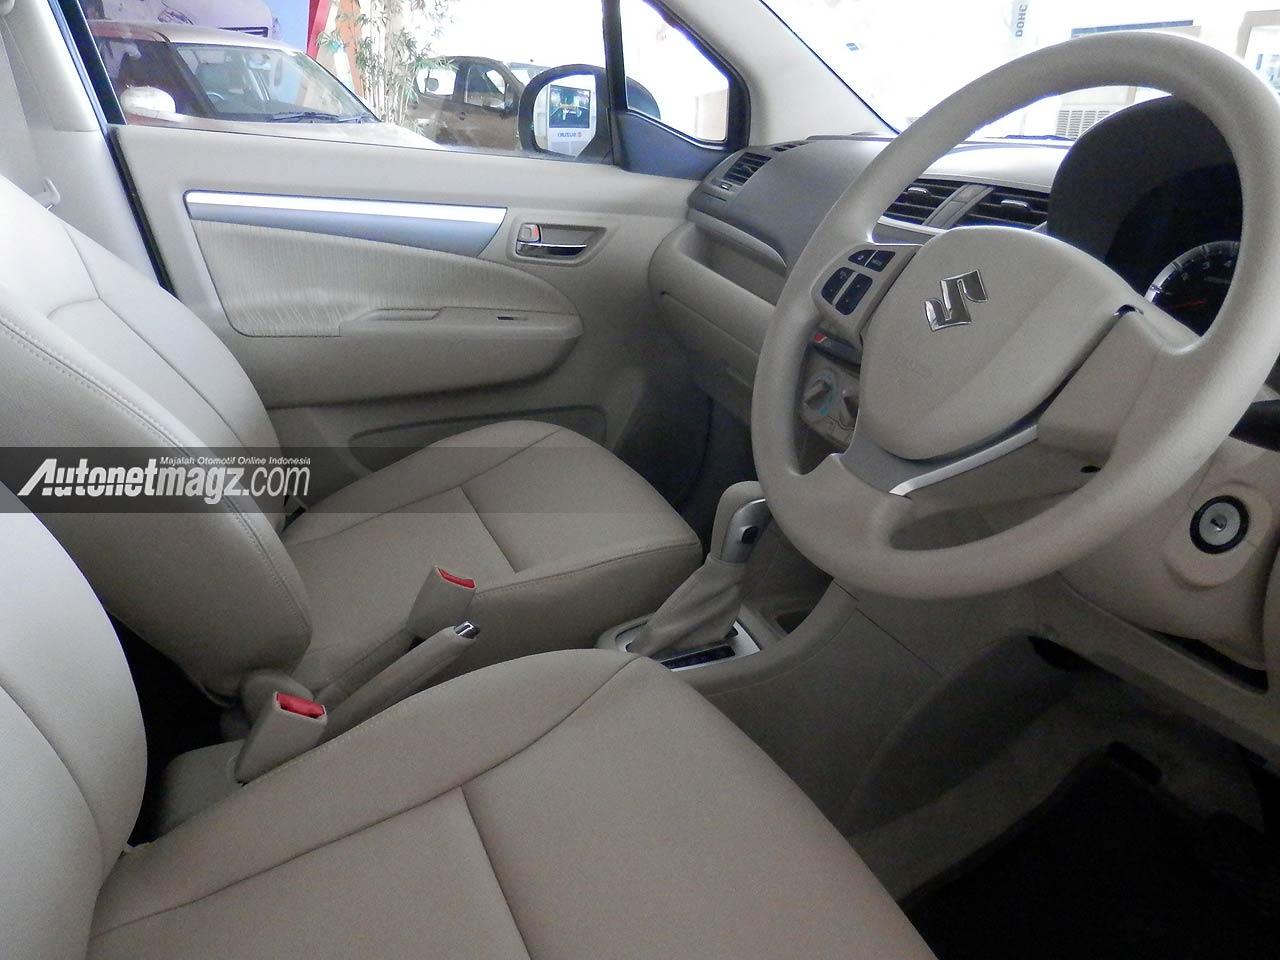 IIMS 2013, Interior kulit Suzuki Ertiga Elegant: Suzuki Ertiga Elegant Tampil Lebih Mewah [with Video]